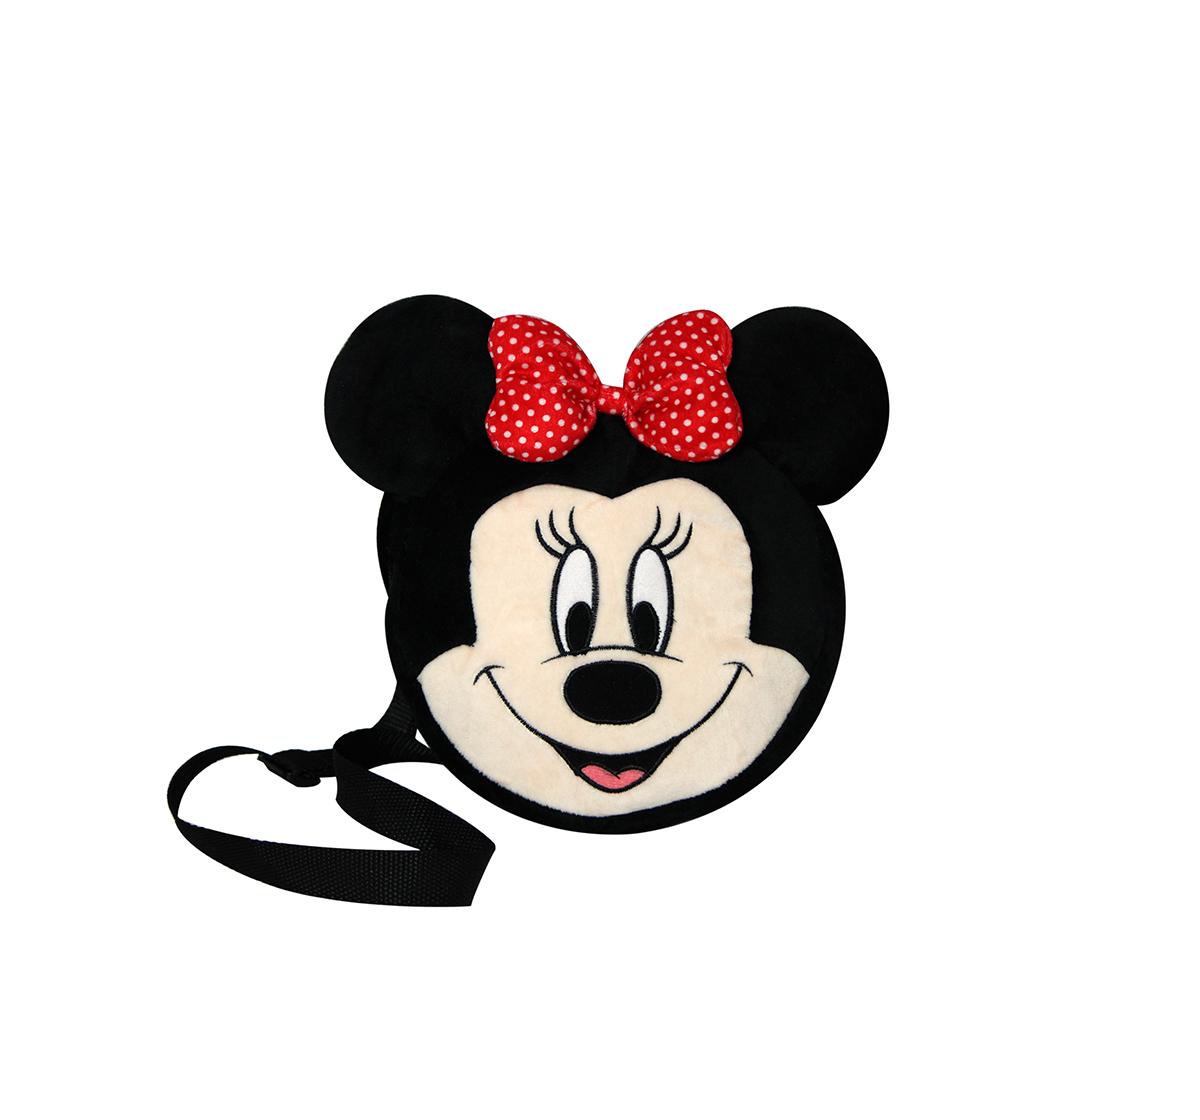 Disney | Disney Minnie Shape Side Bag Plush Accessories for Kids age 12M+ - 19.05 Cm